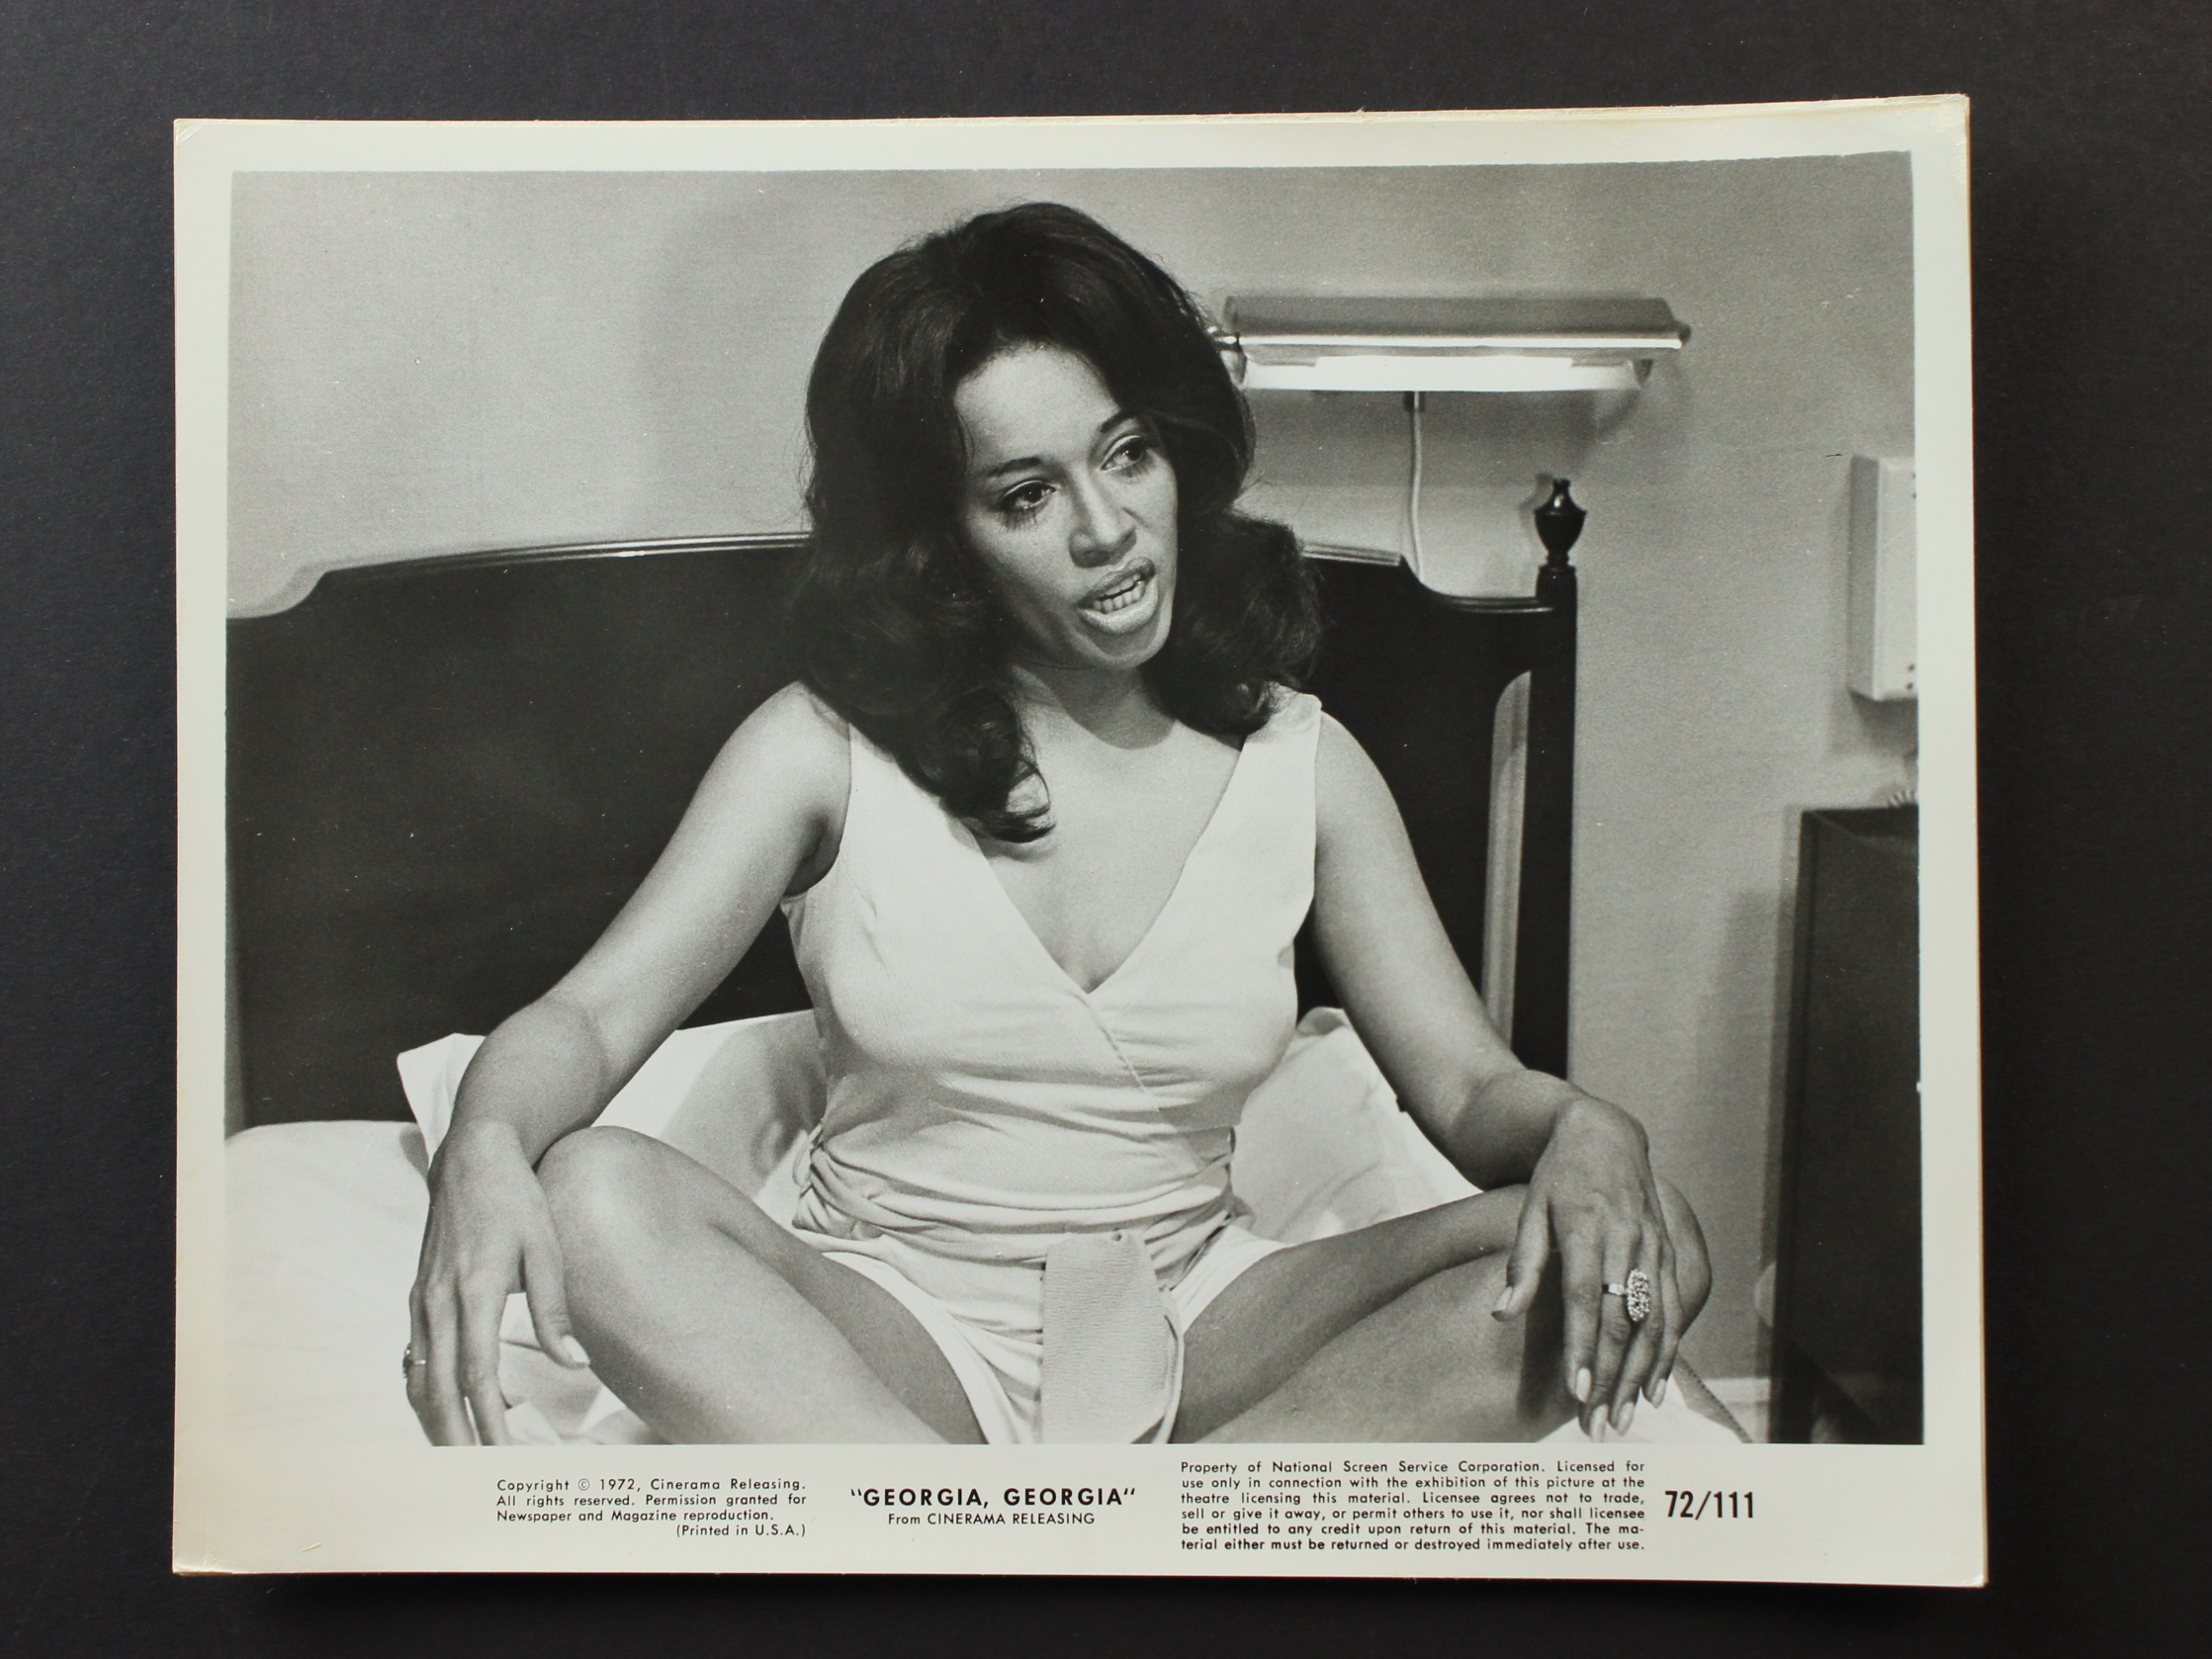 Georgia, Georgia (1972)